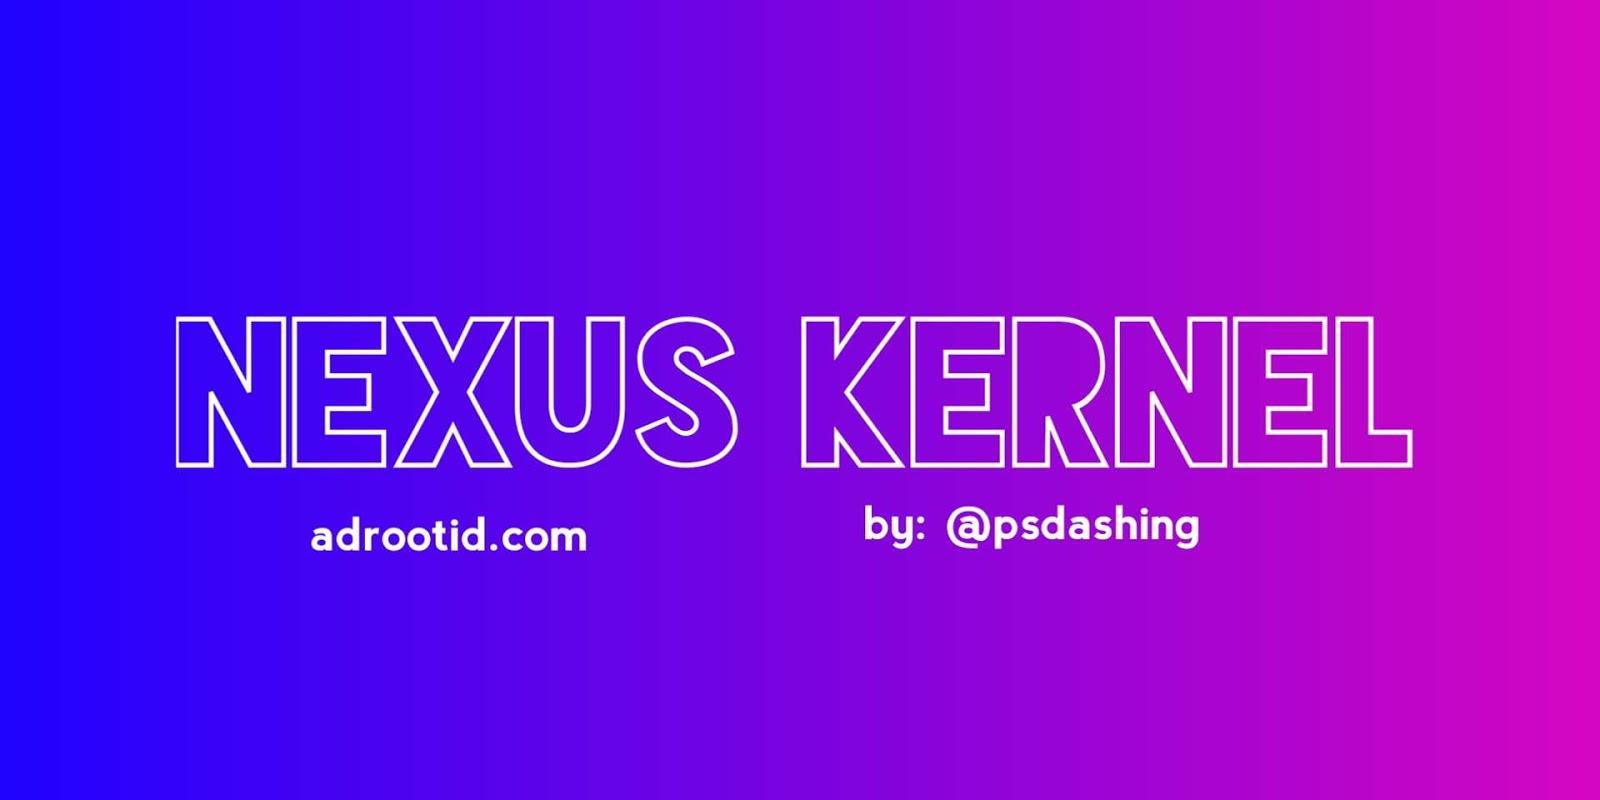 Kernel nexus redmi 4x